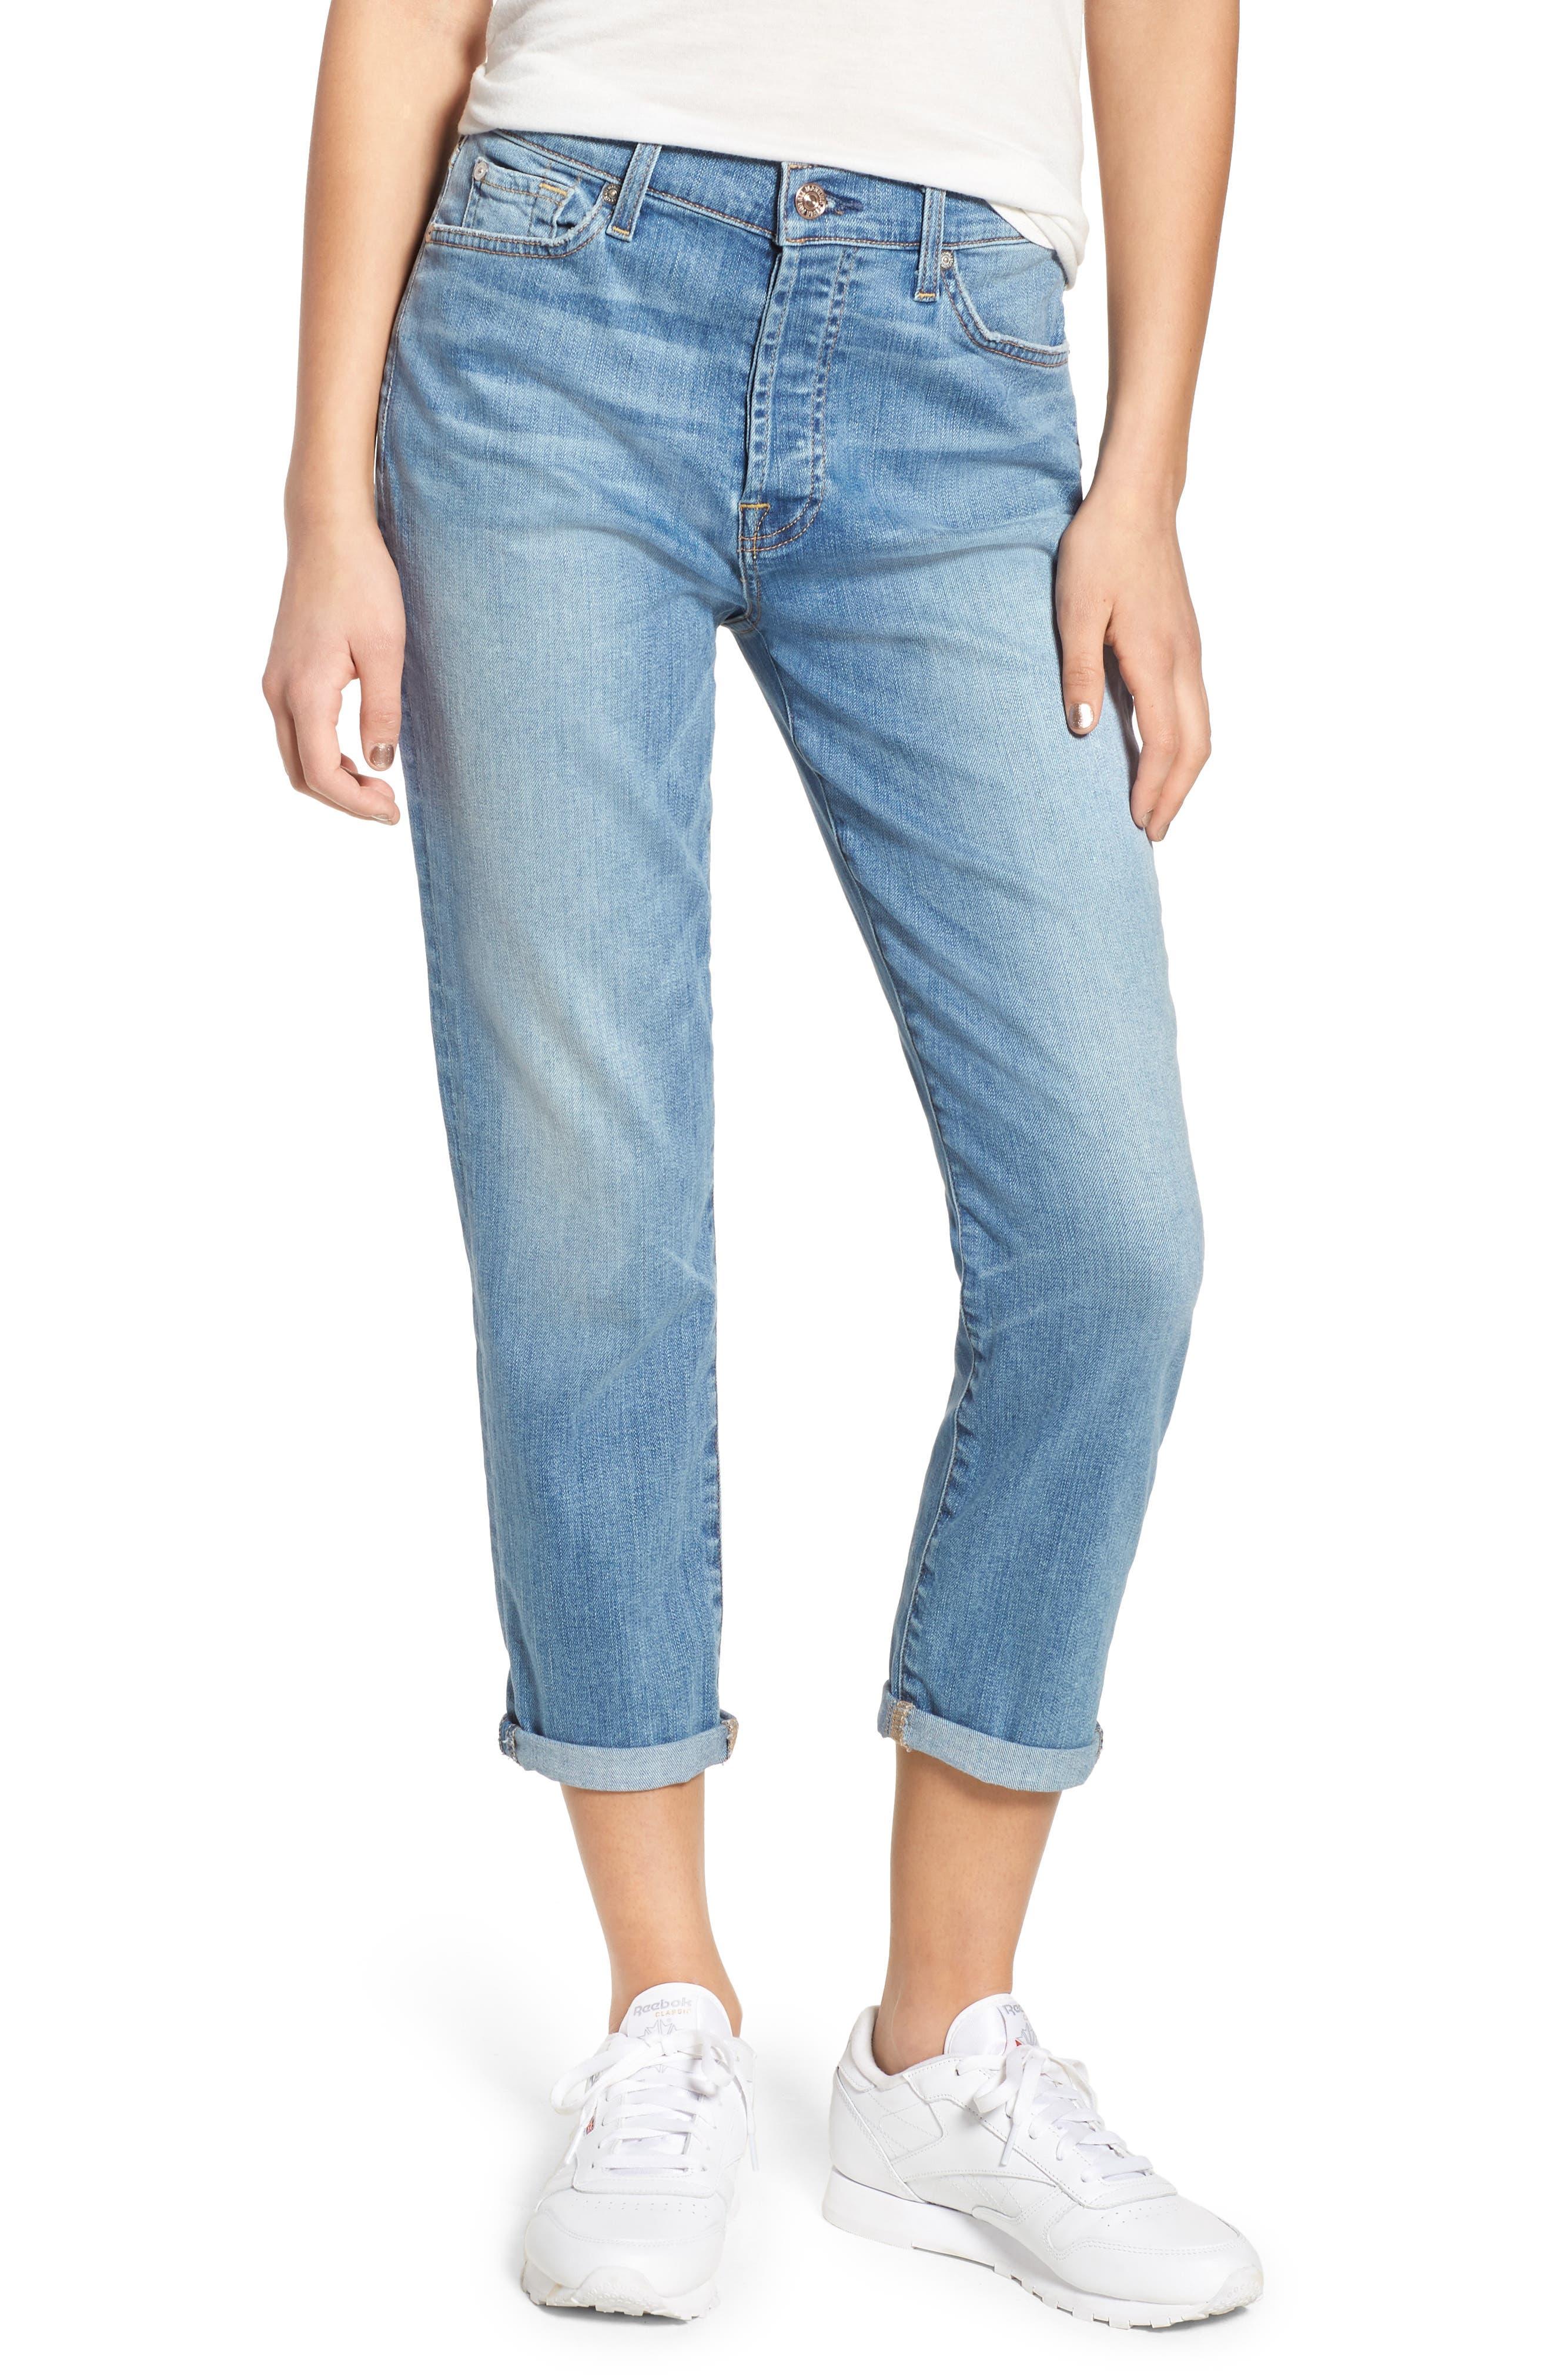 Main Image - 7 For All Mankind® Josefina High Waist Boyfriend Jeans (Heritage Valley 4)